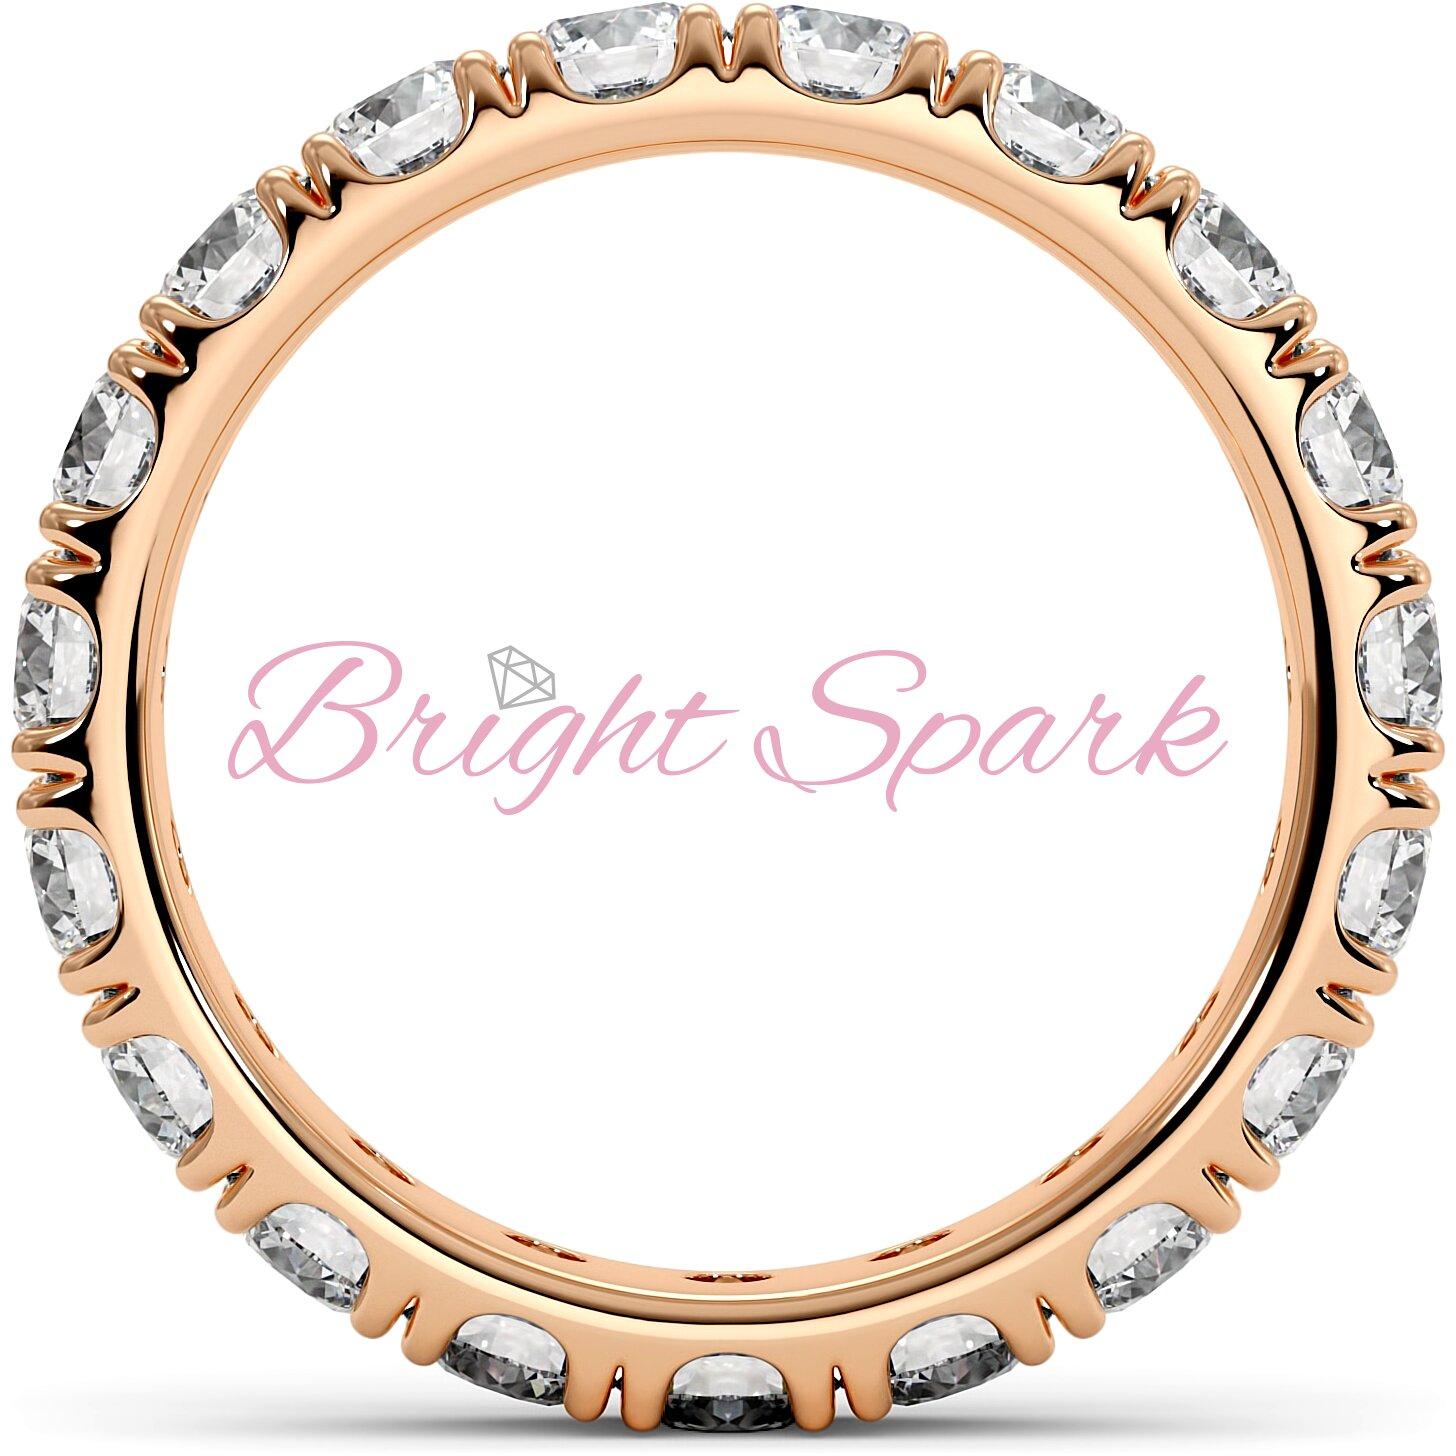 Изящное кольцо розового золота с камнями по кругу